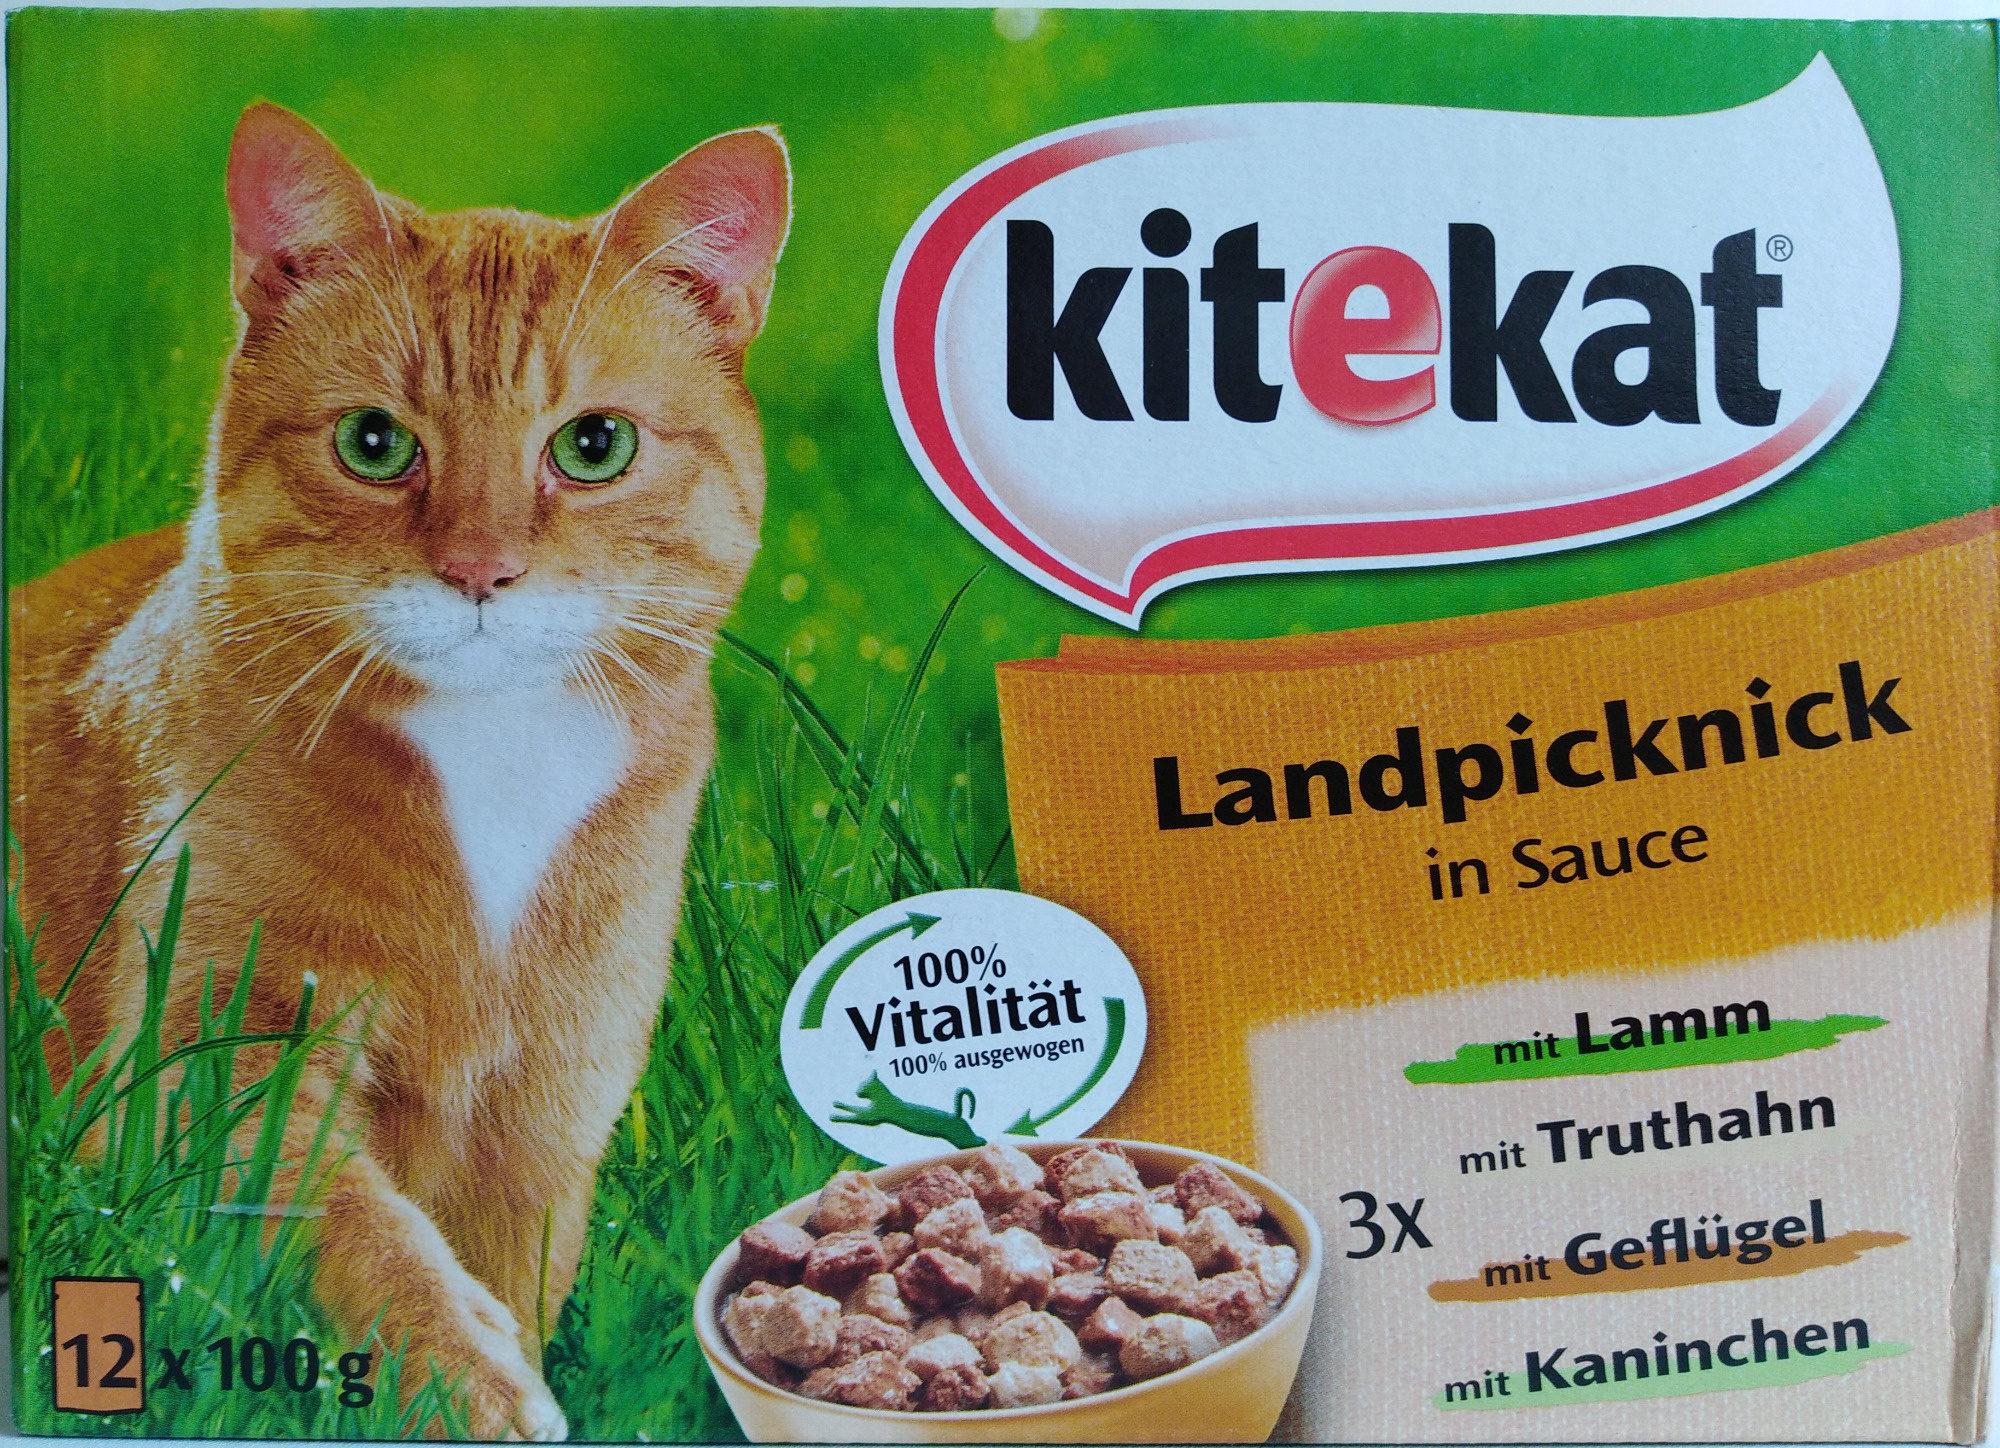 Landpicknick in Sauce - Product - de